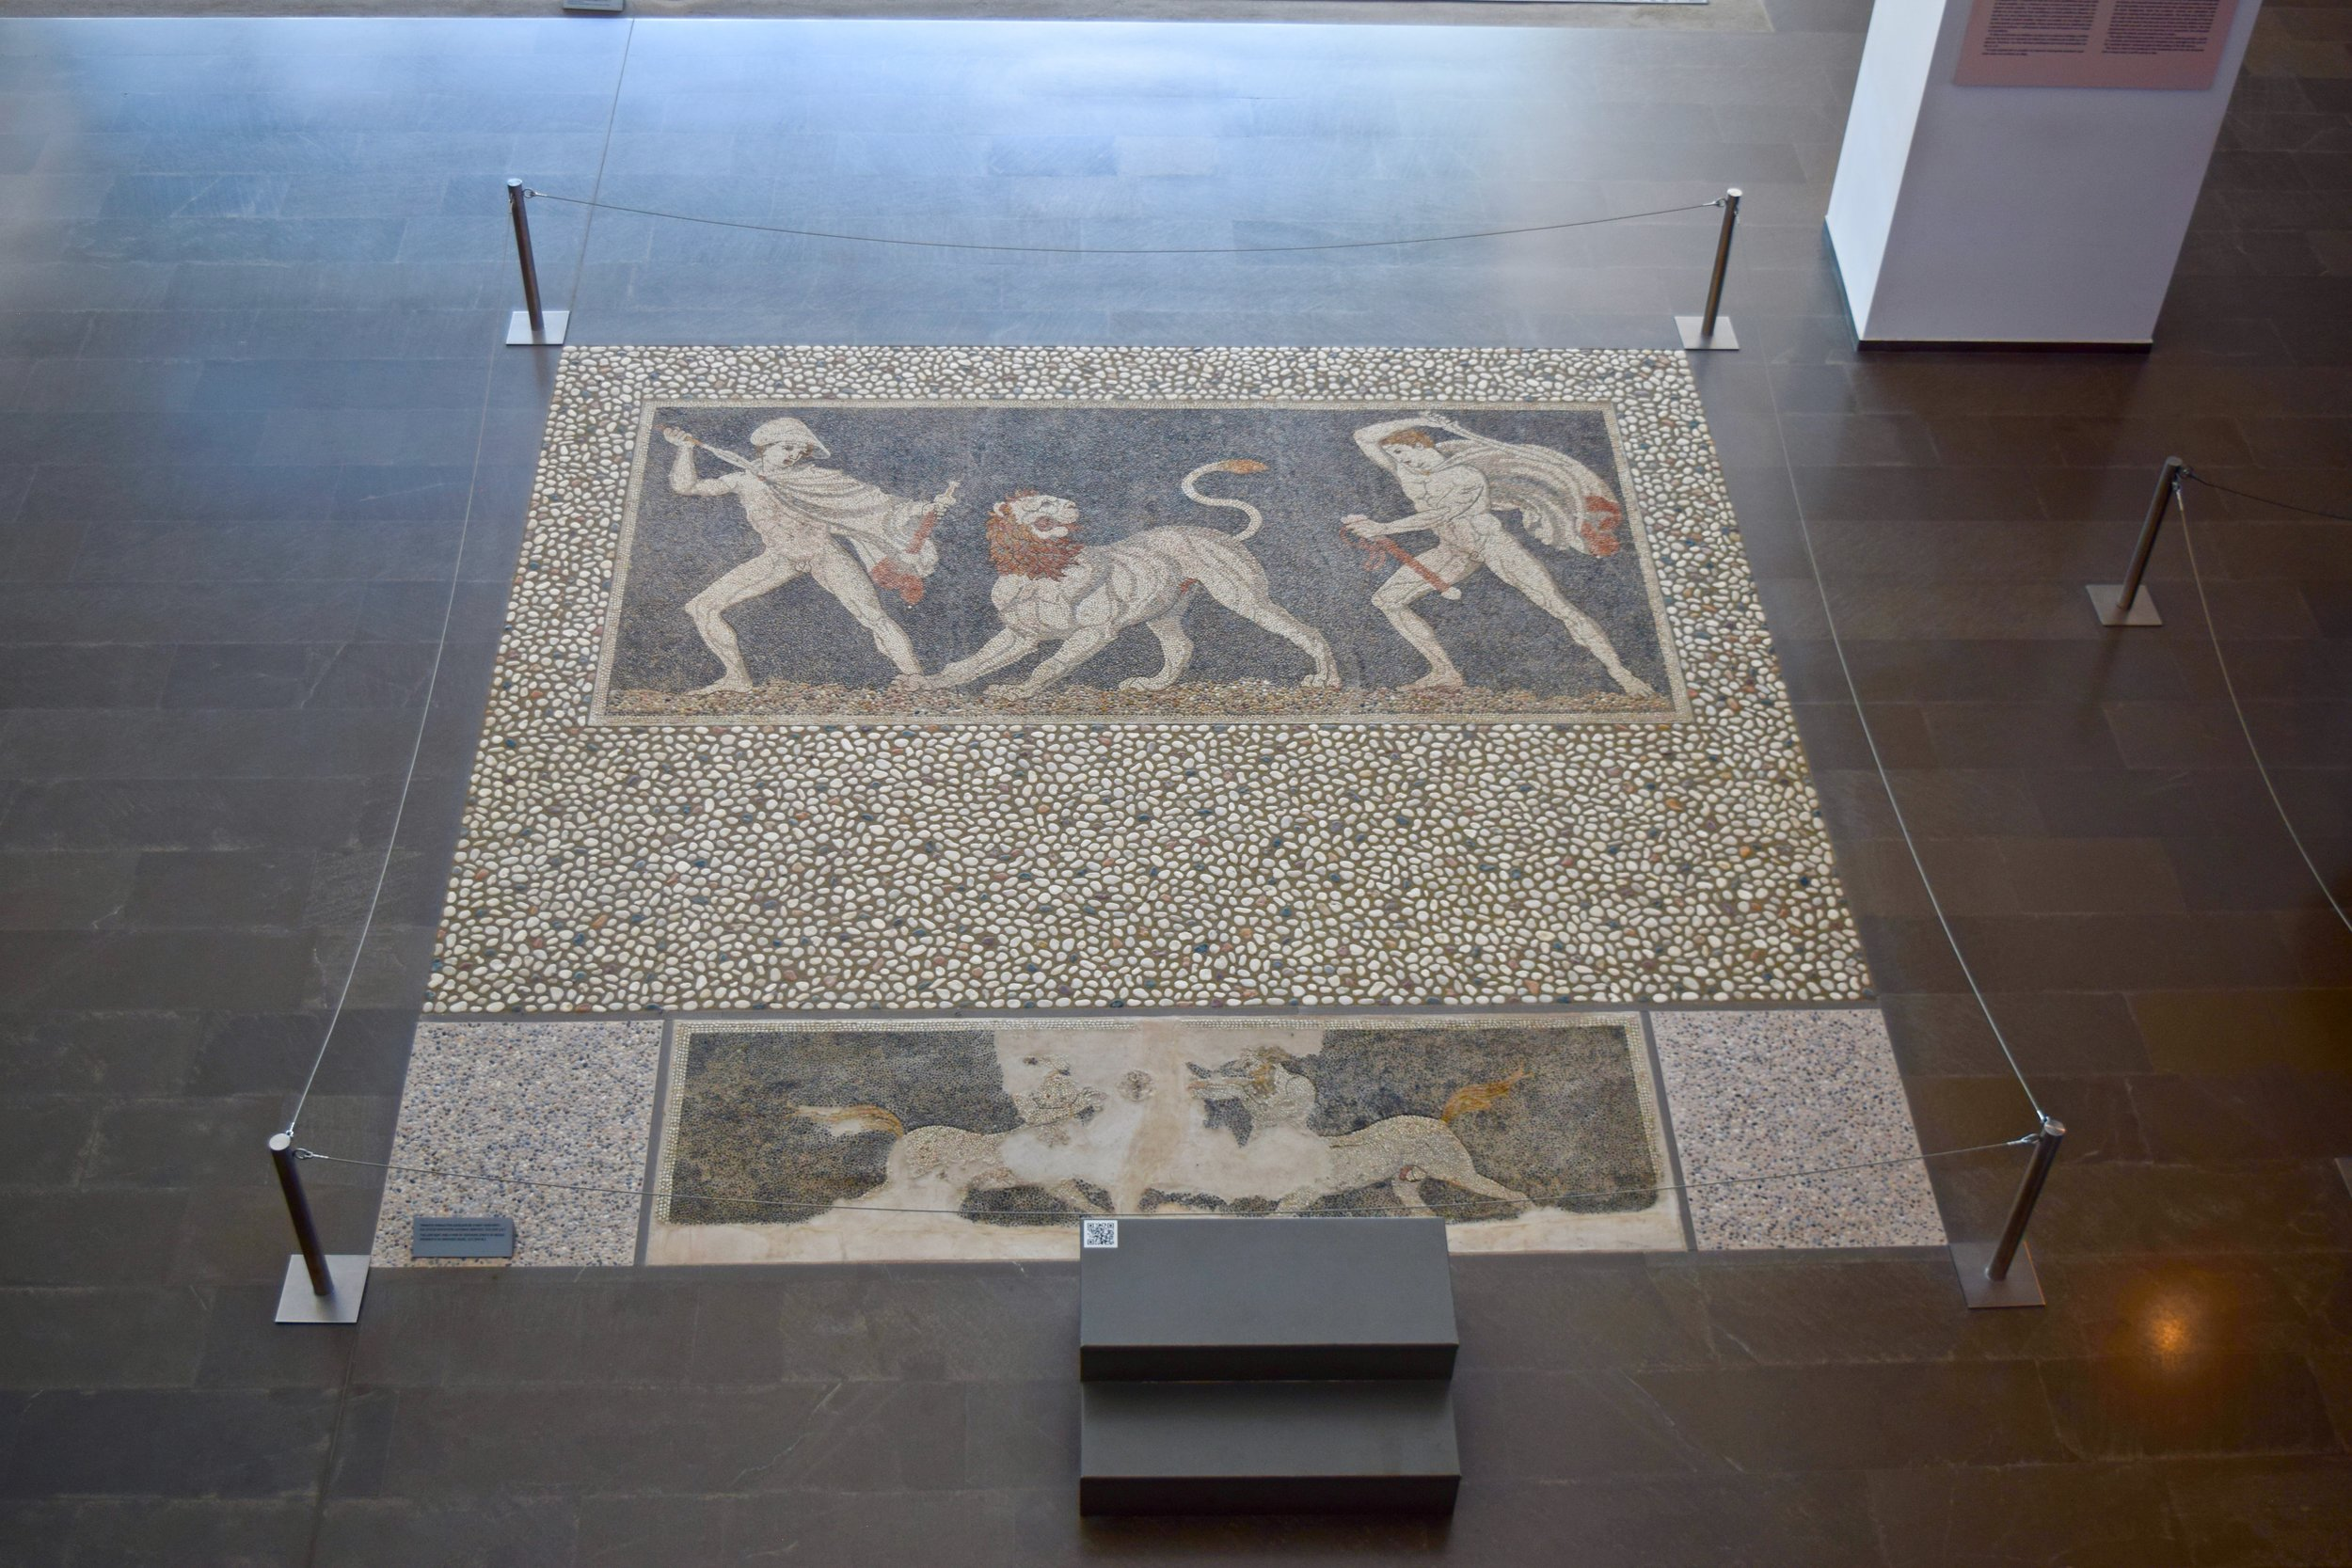 Lion hunt mosaic